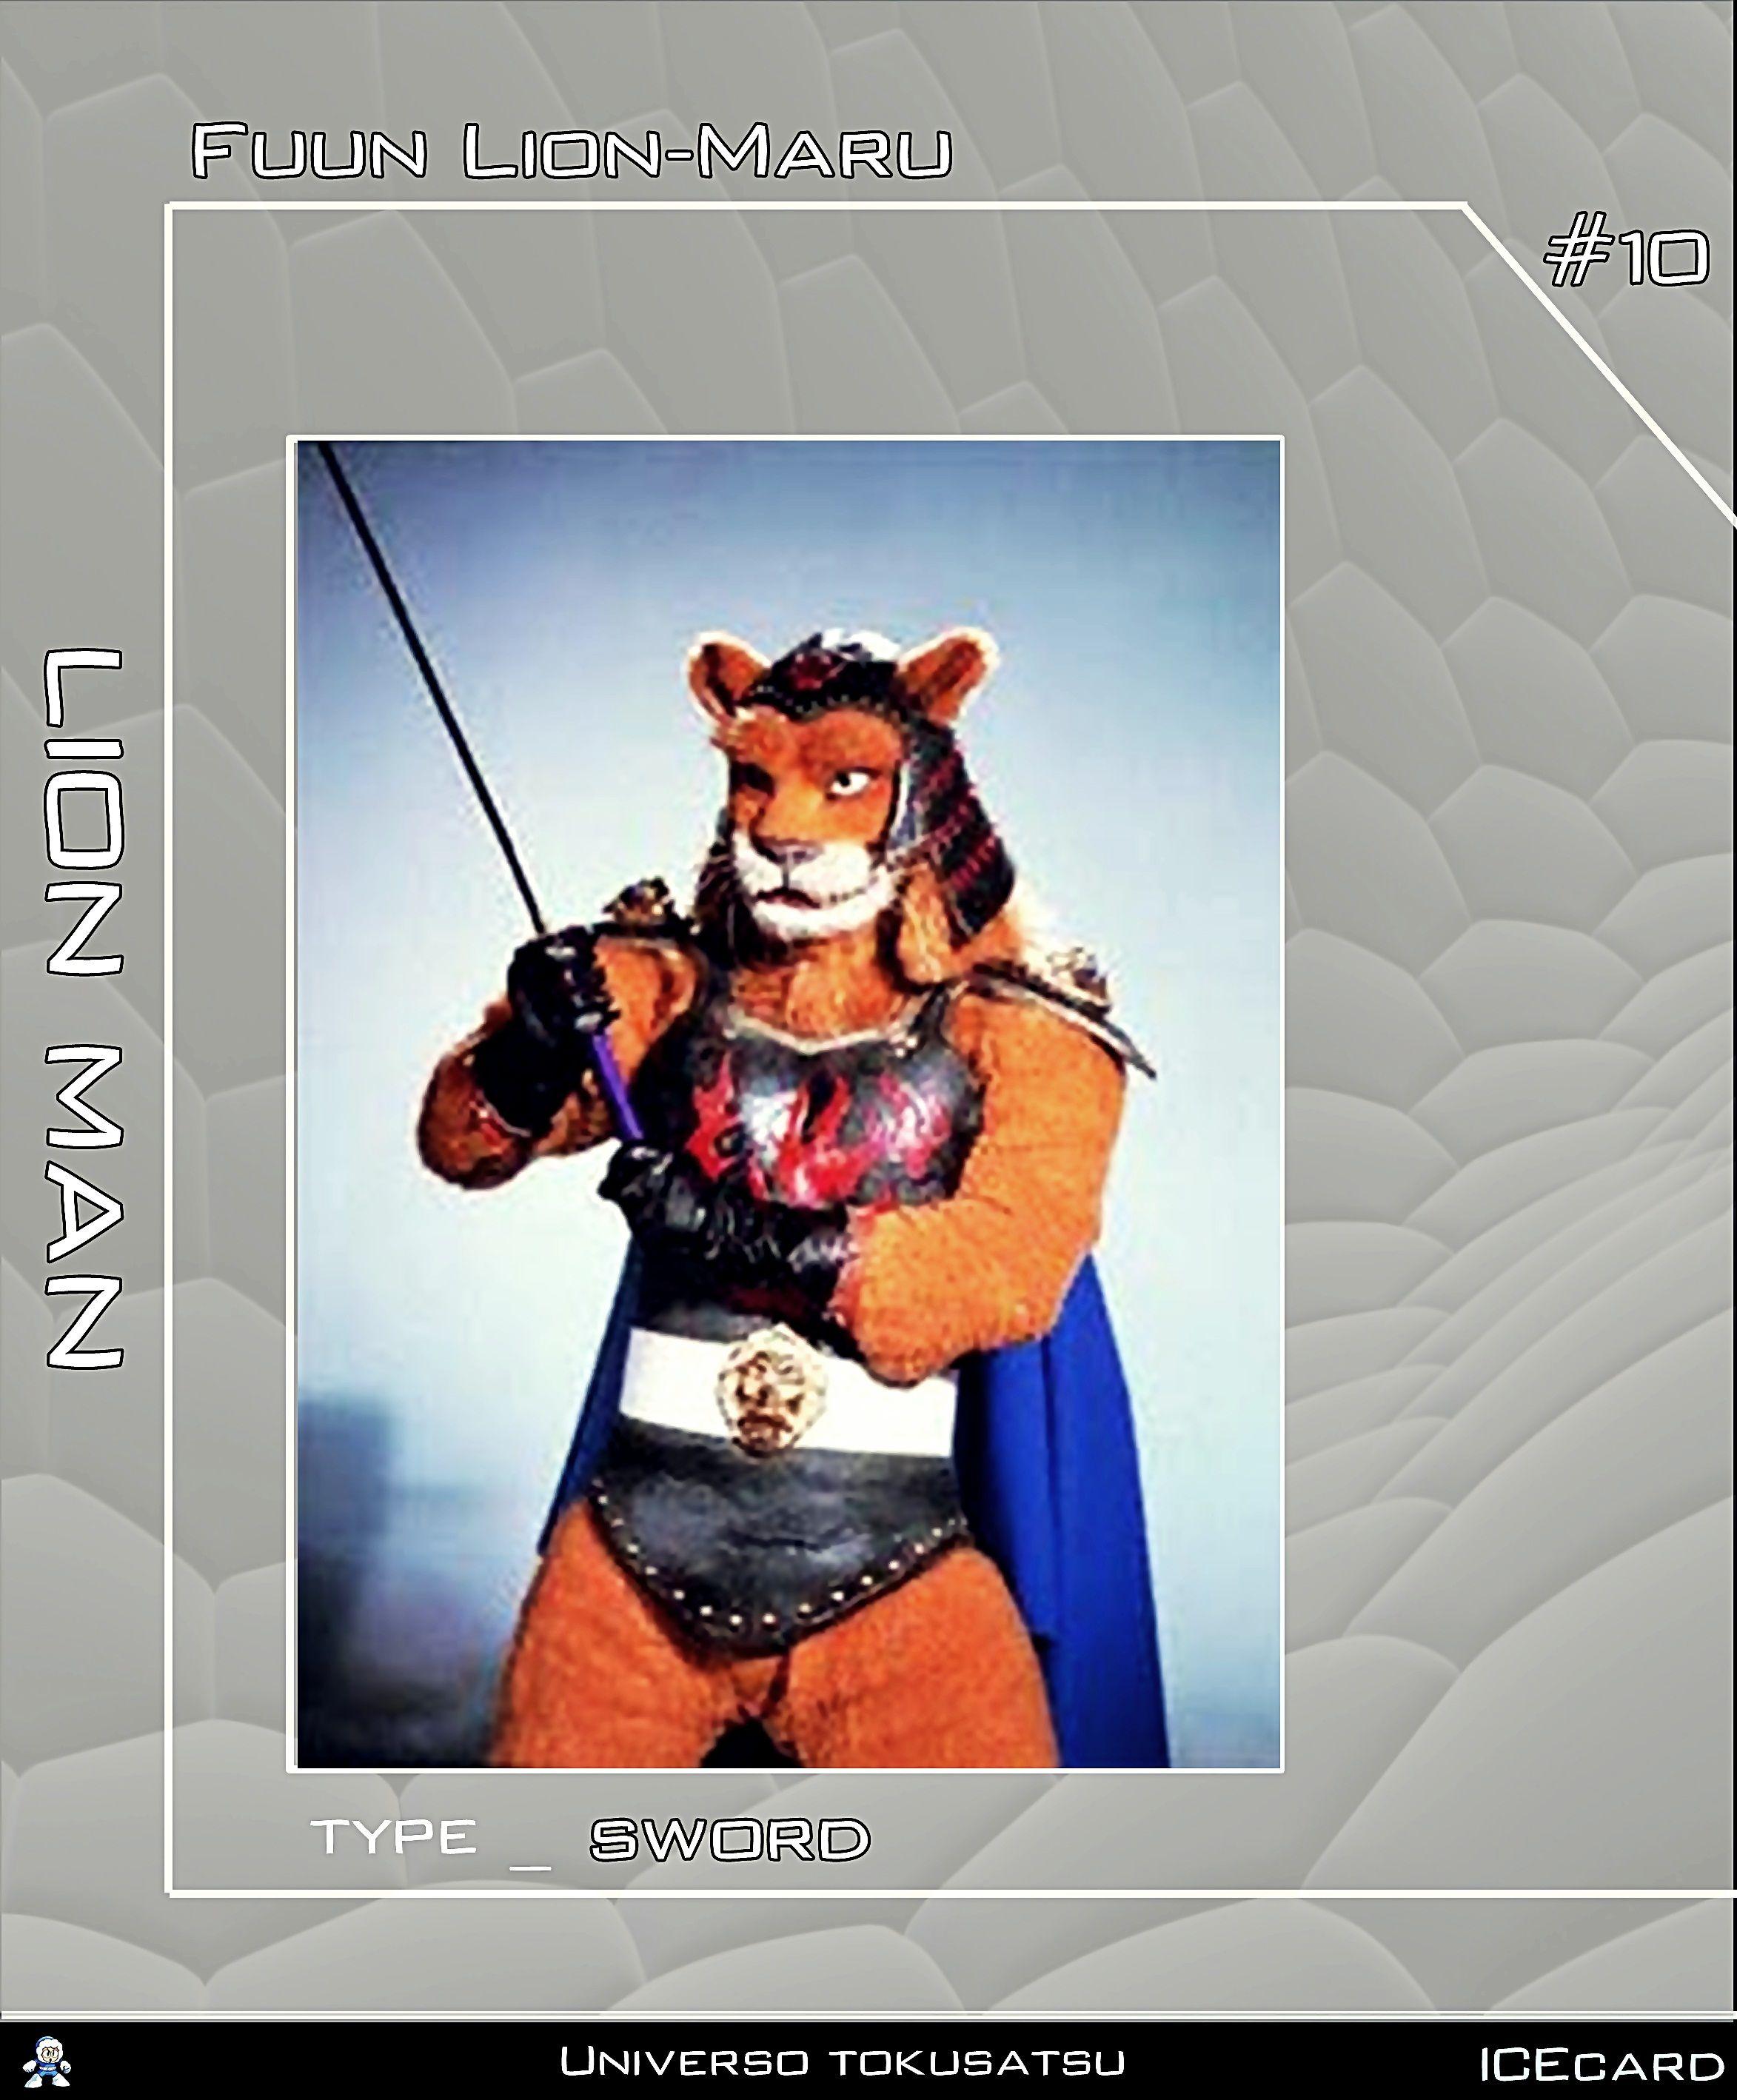 Pin De Rafa Mendes Em Ice Card Hero Tokusatsu Jaspion Super Heroi